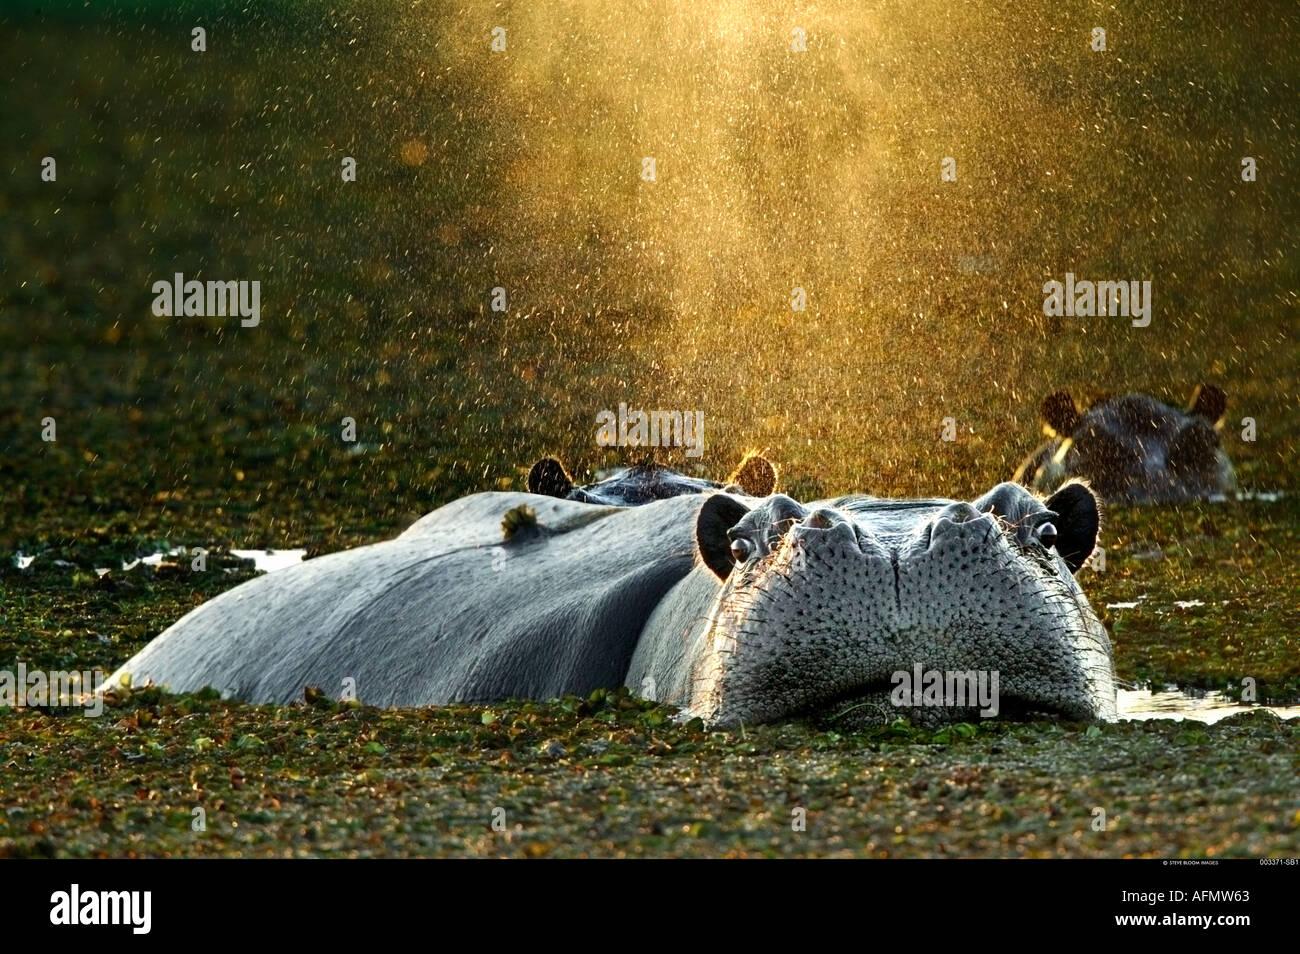 Hipopótamos bañarse Delta del Okavango Botswana Imagen De Stock